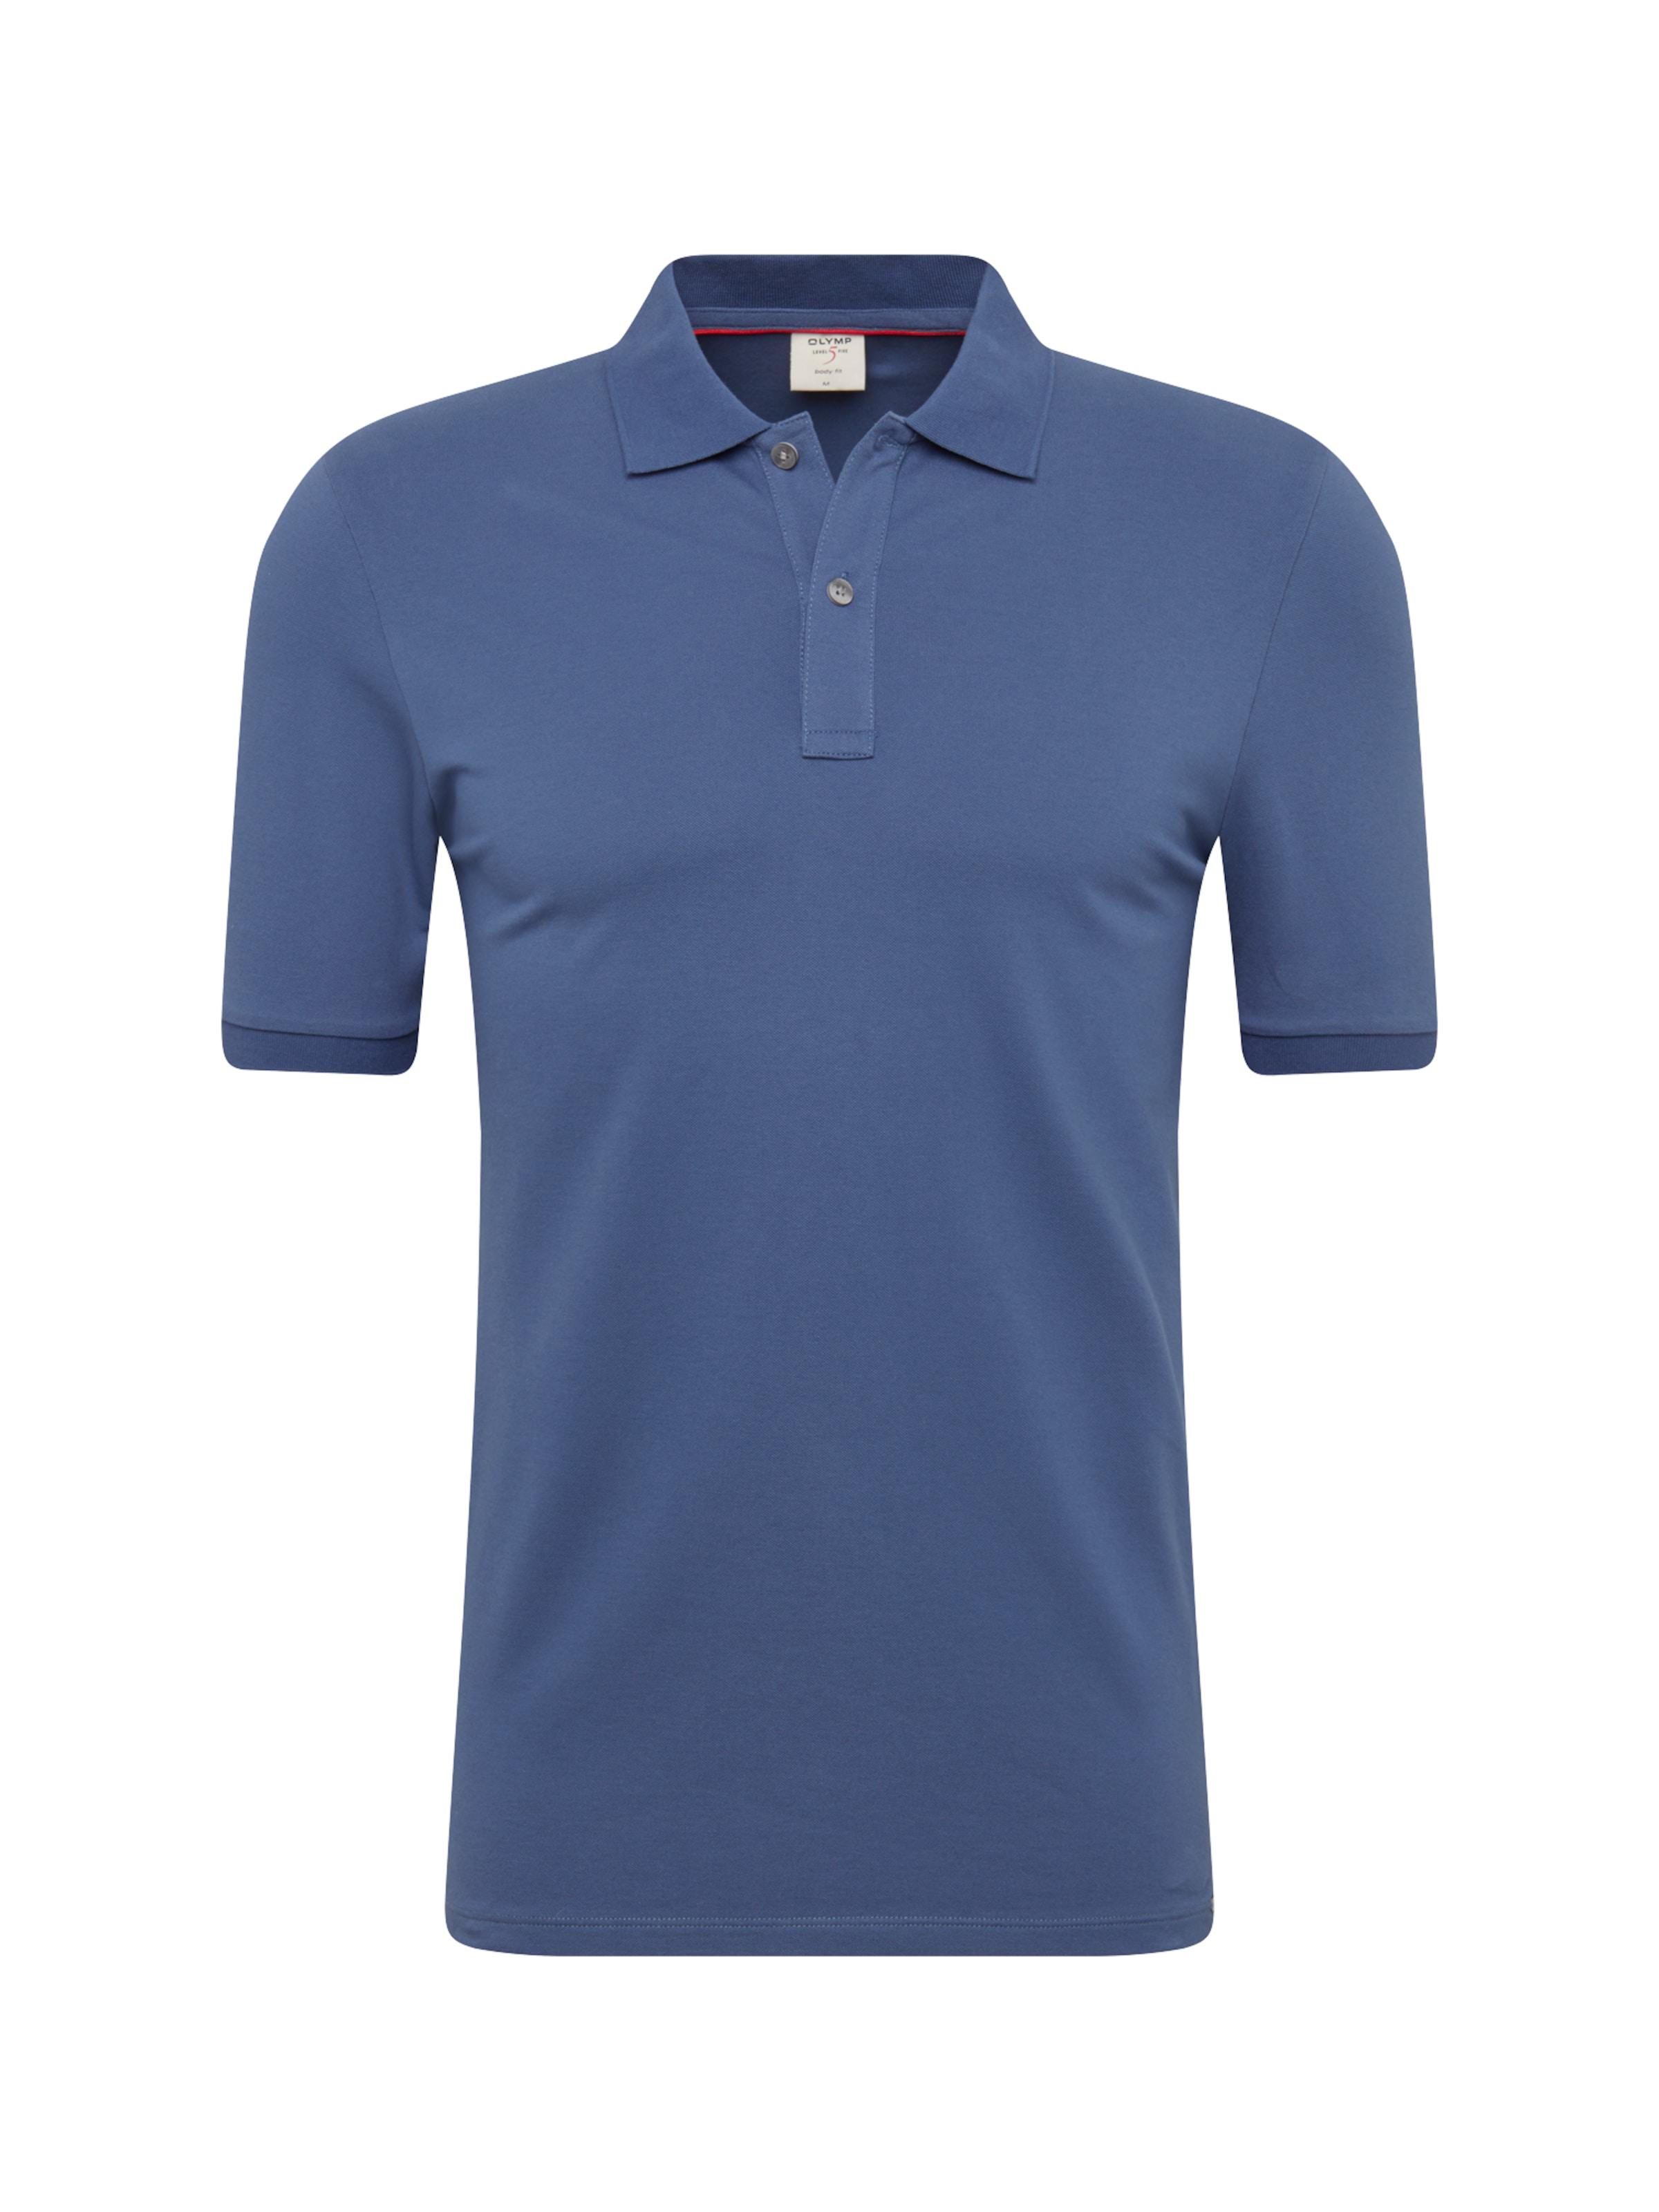 Cotton' Polo 'level En 5 Olymp Casual T Indigo shirt xqPwnUYA